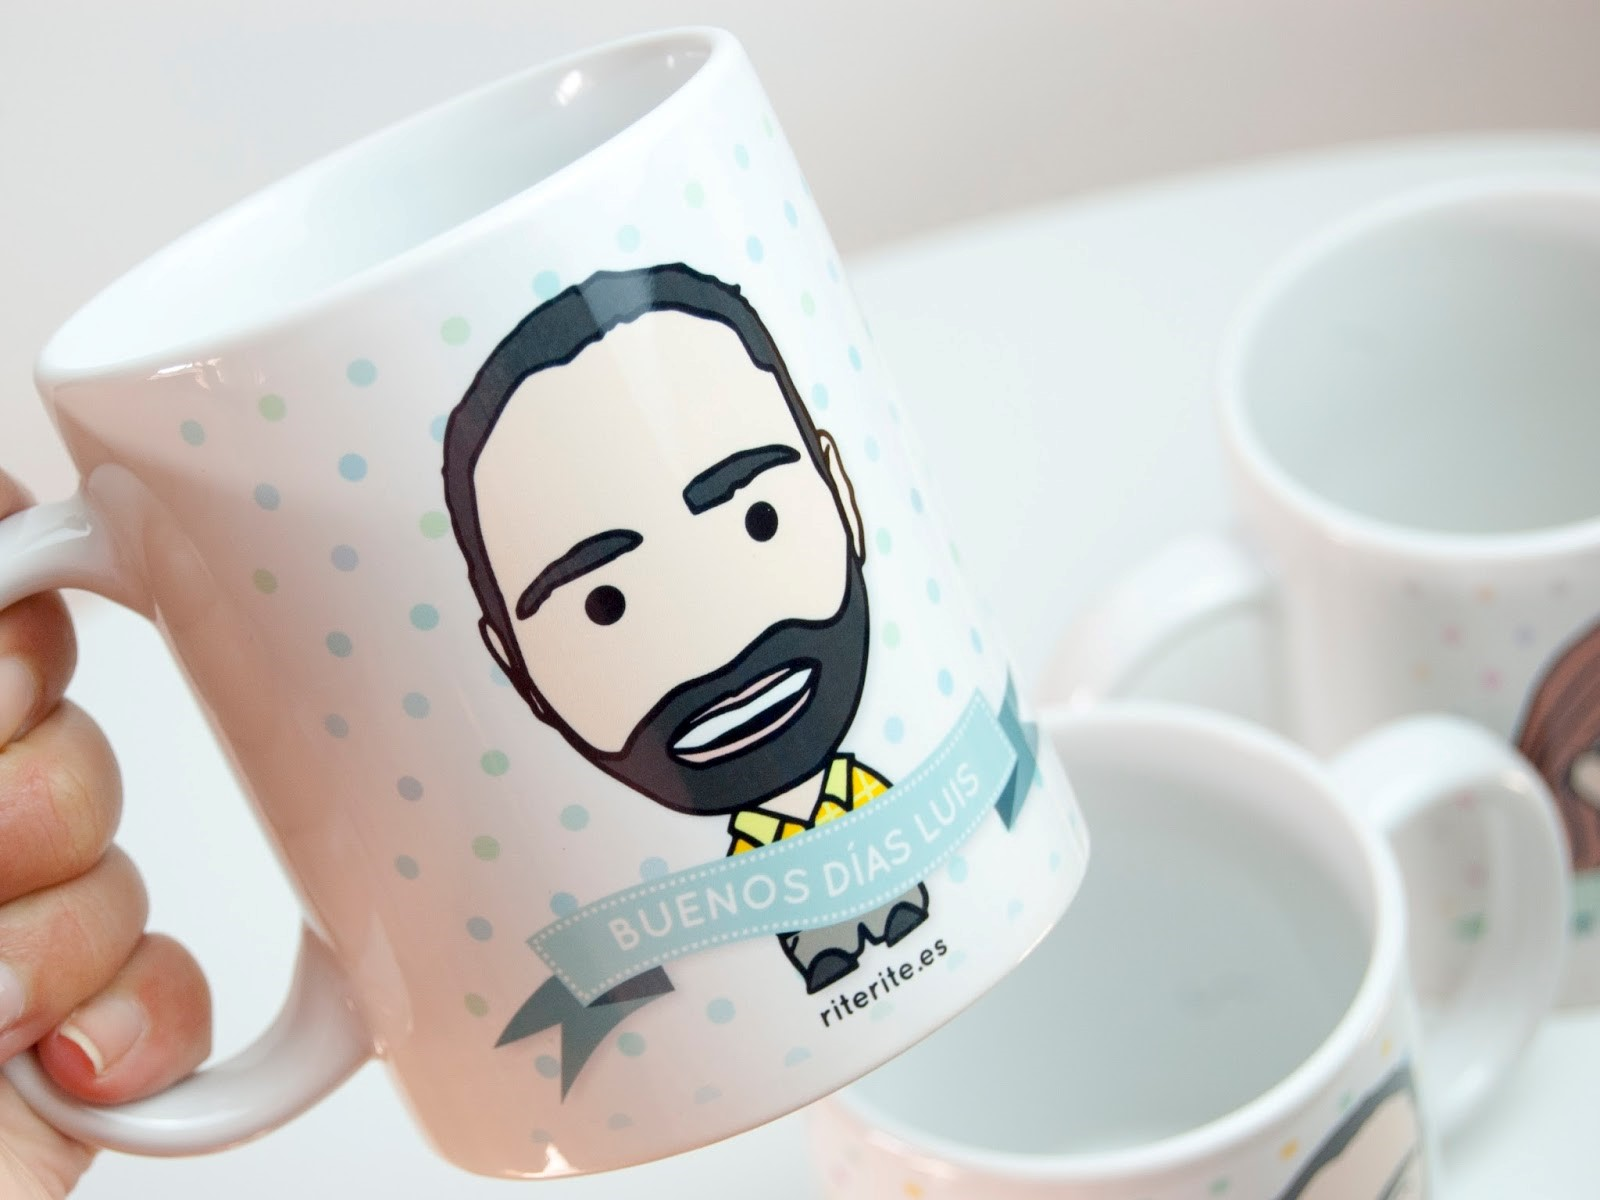 Aprovecha y regala una taza personalizada